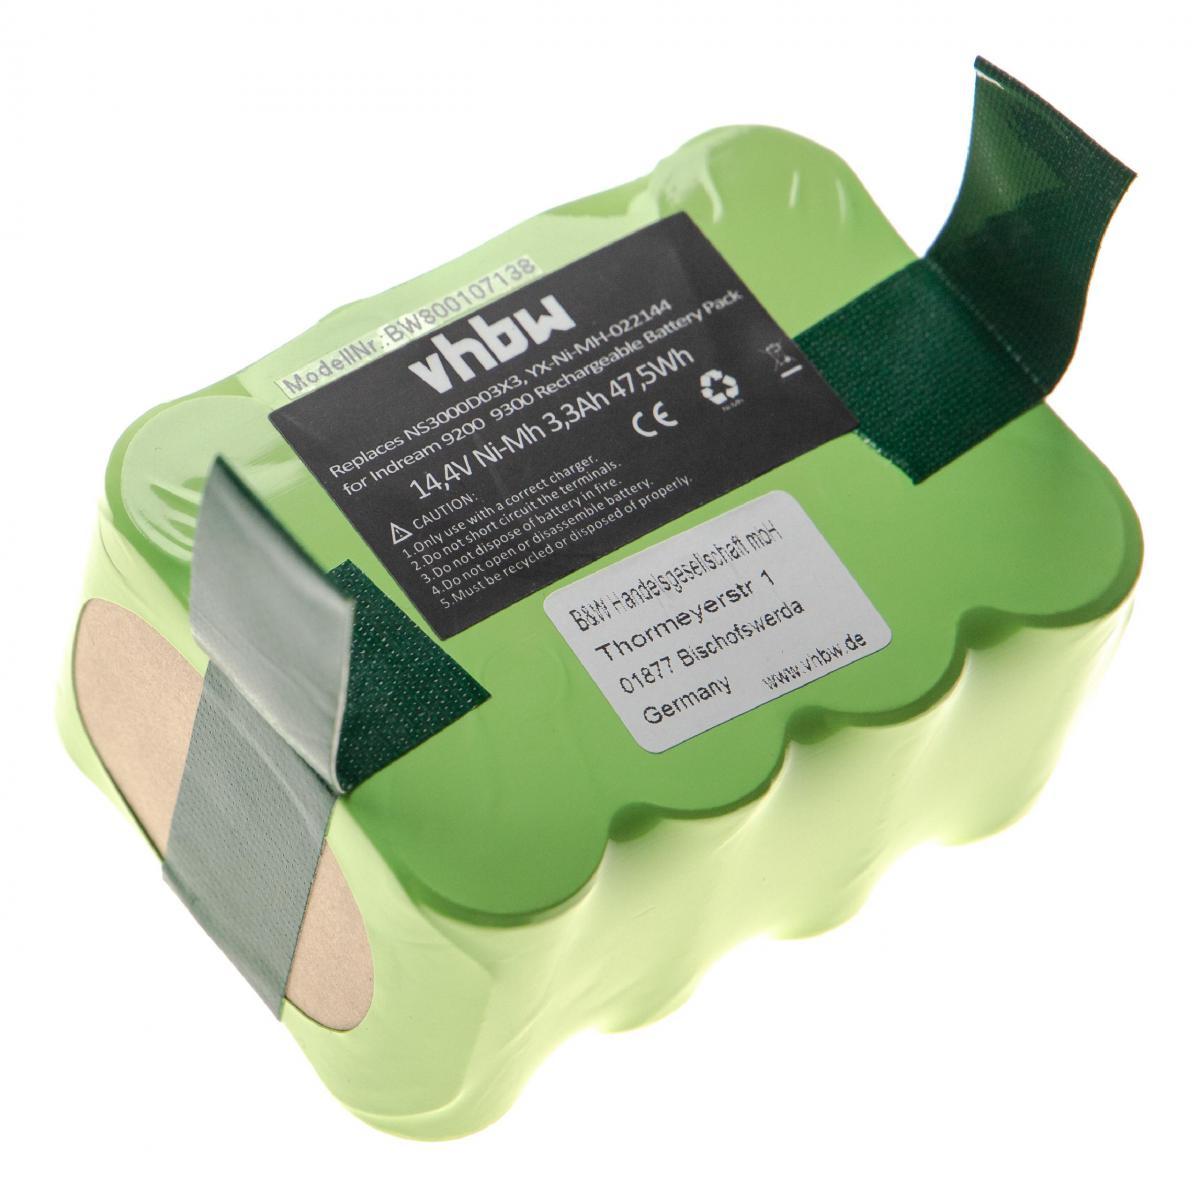 Vhbw vhbw batterie NiMH 3300mAh (14.4V) pour aspirateur, Home Cleaner compatible avec Yoo Digital Iwip 1000, 600 remplace YX-